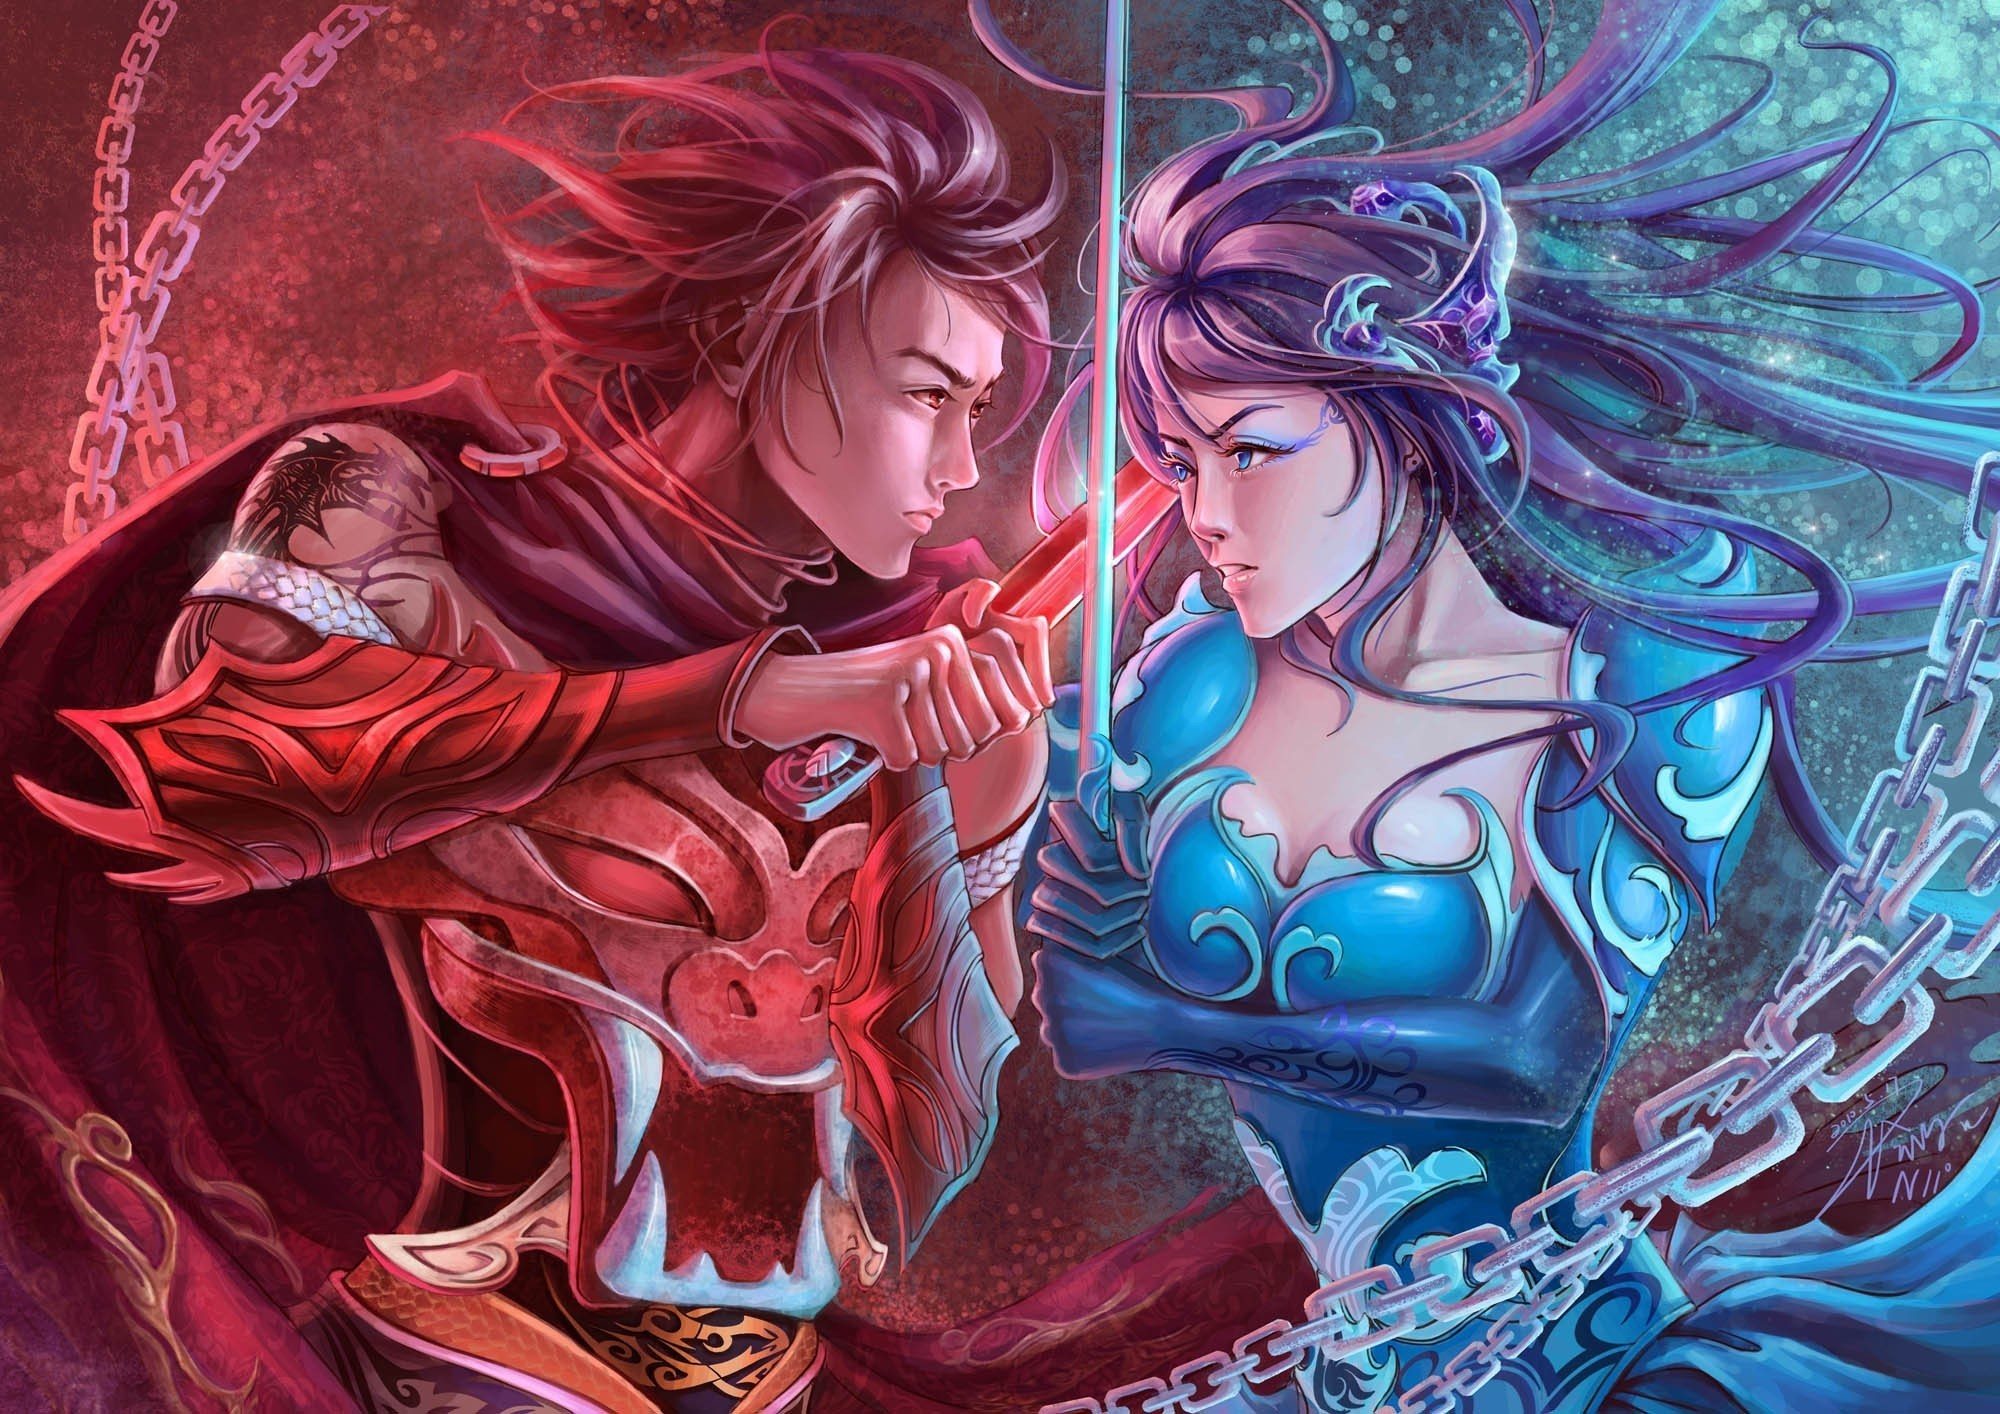 Fantasy warrior women females girls men males weapons battle sword wallpaper      45223   WallpaperUP